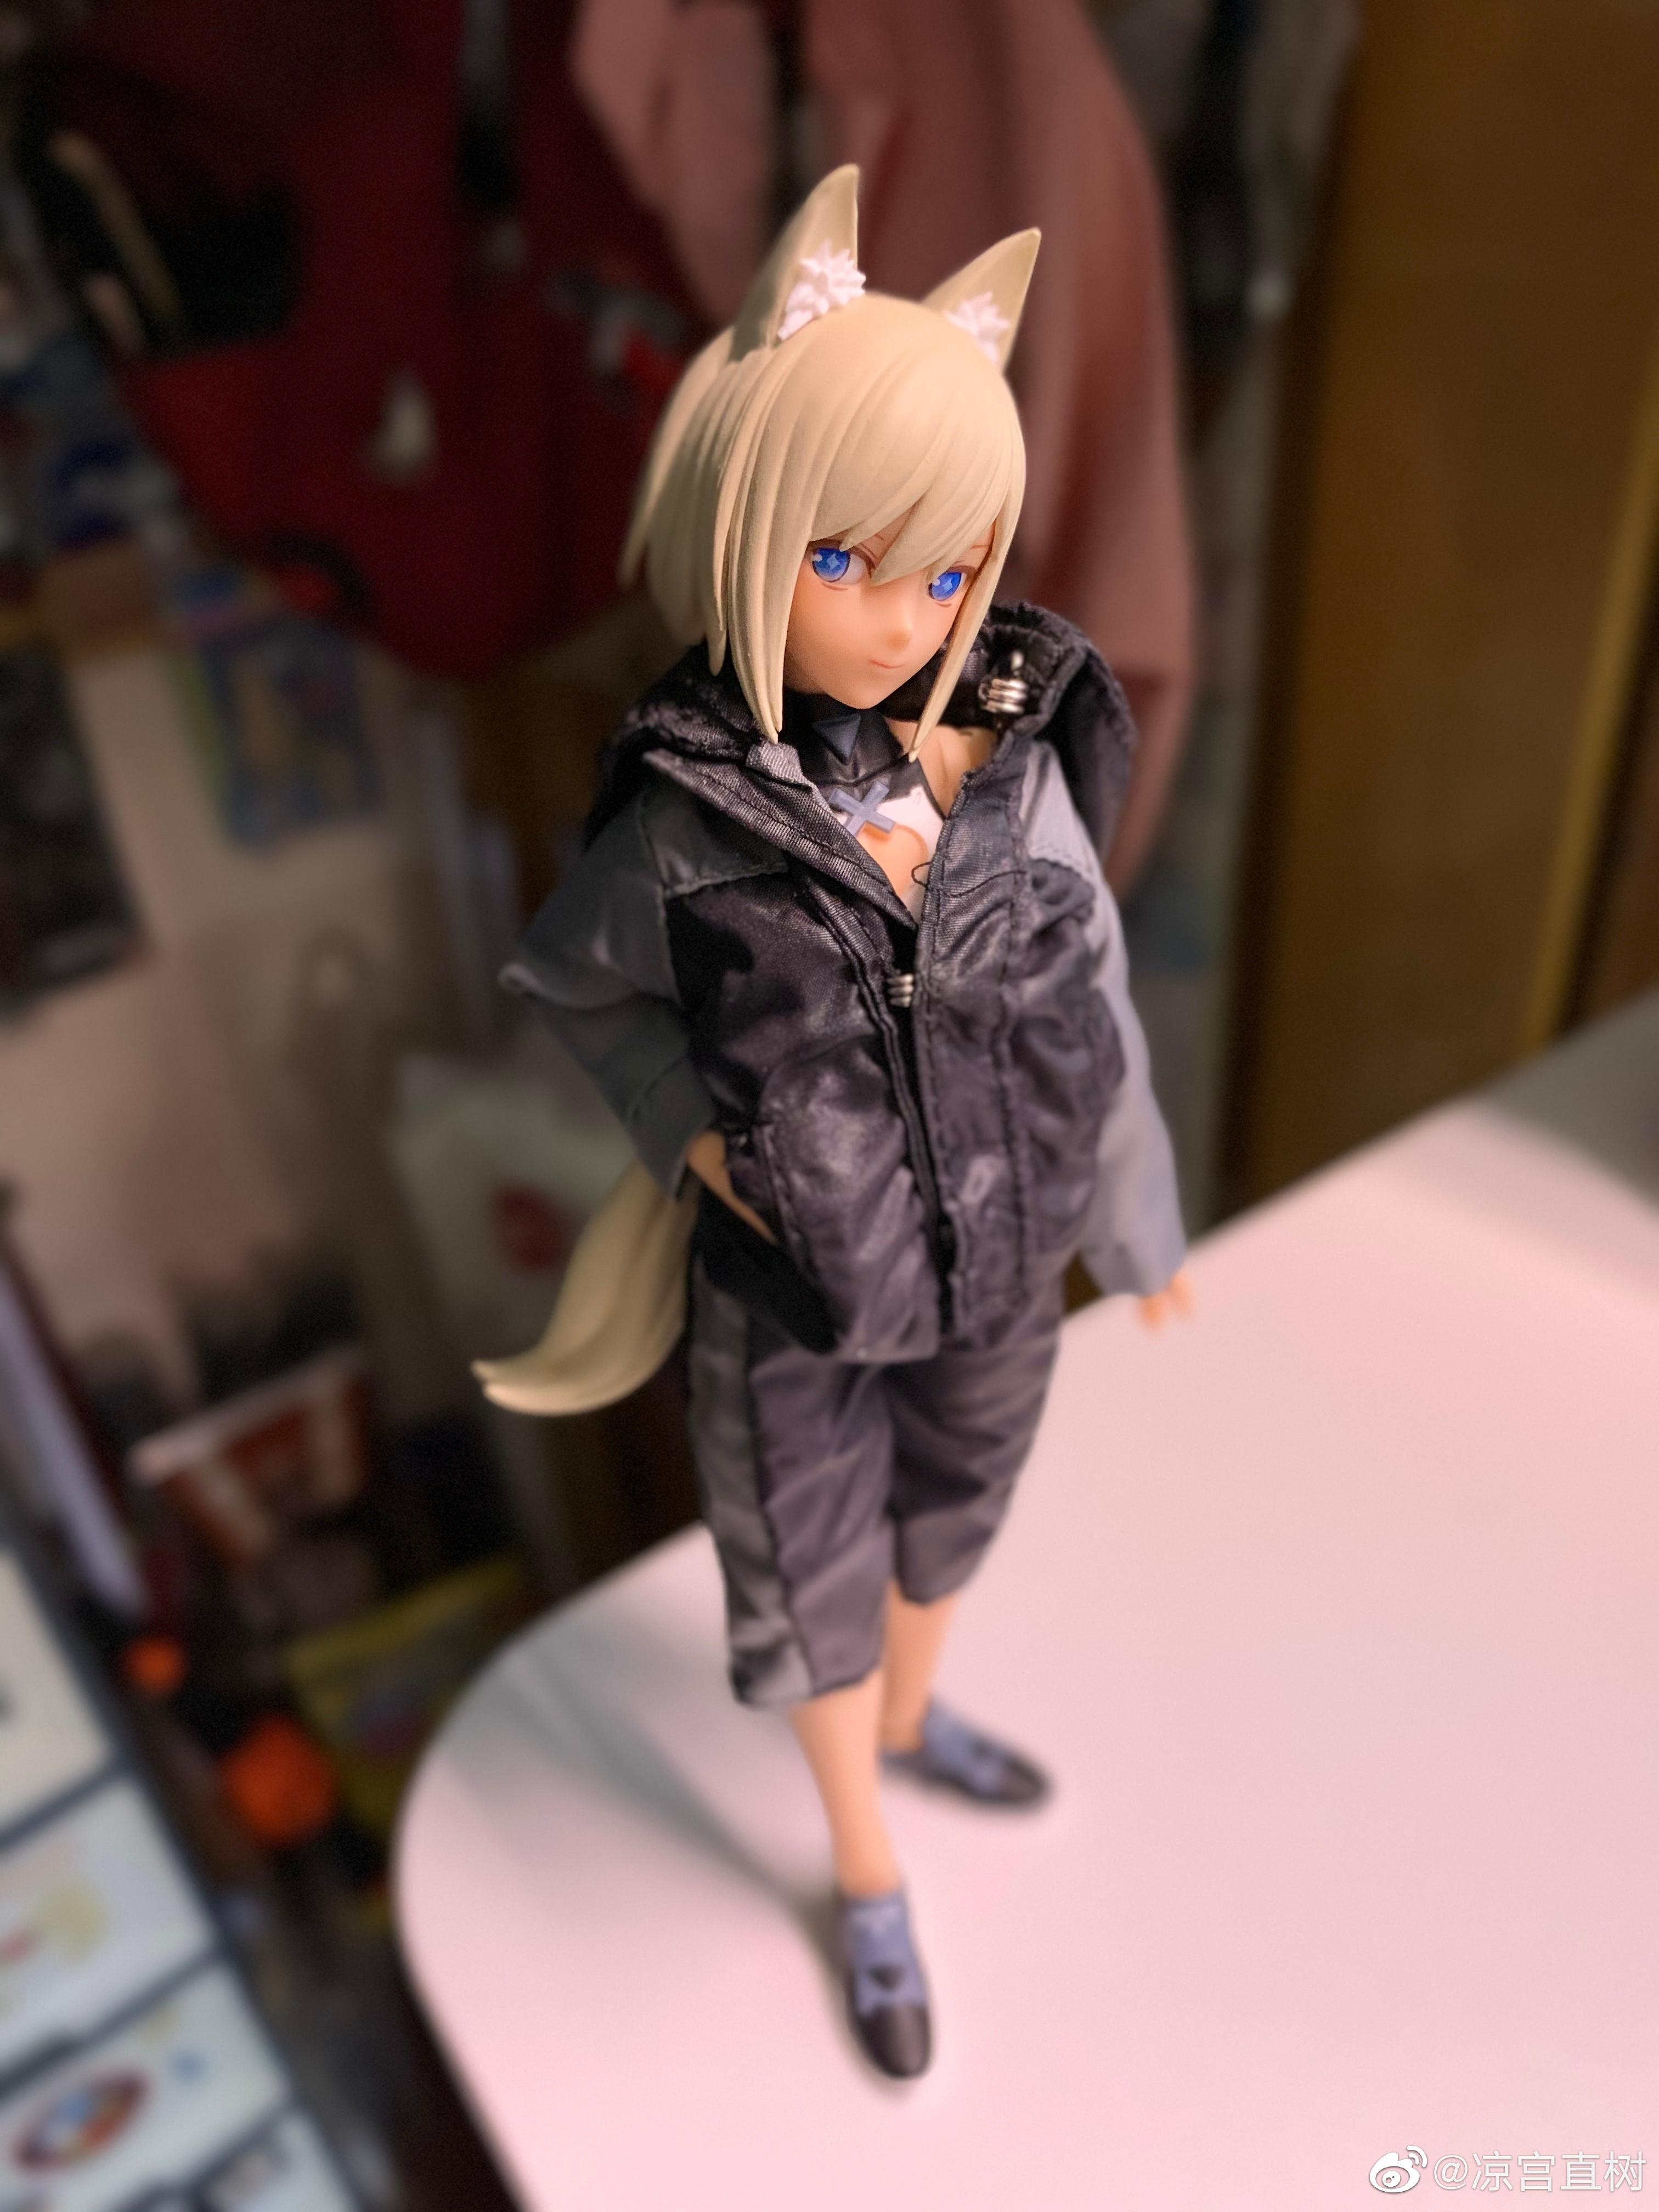 S426_Snall_Shell_mizugi_wolf_gril_028.jpg